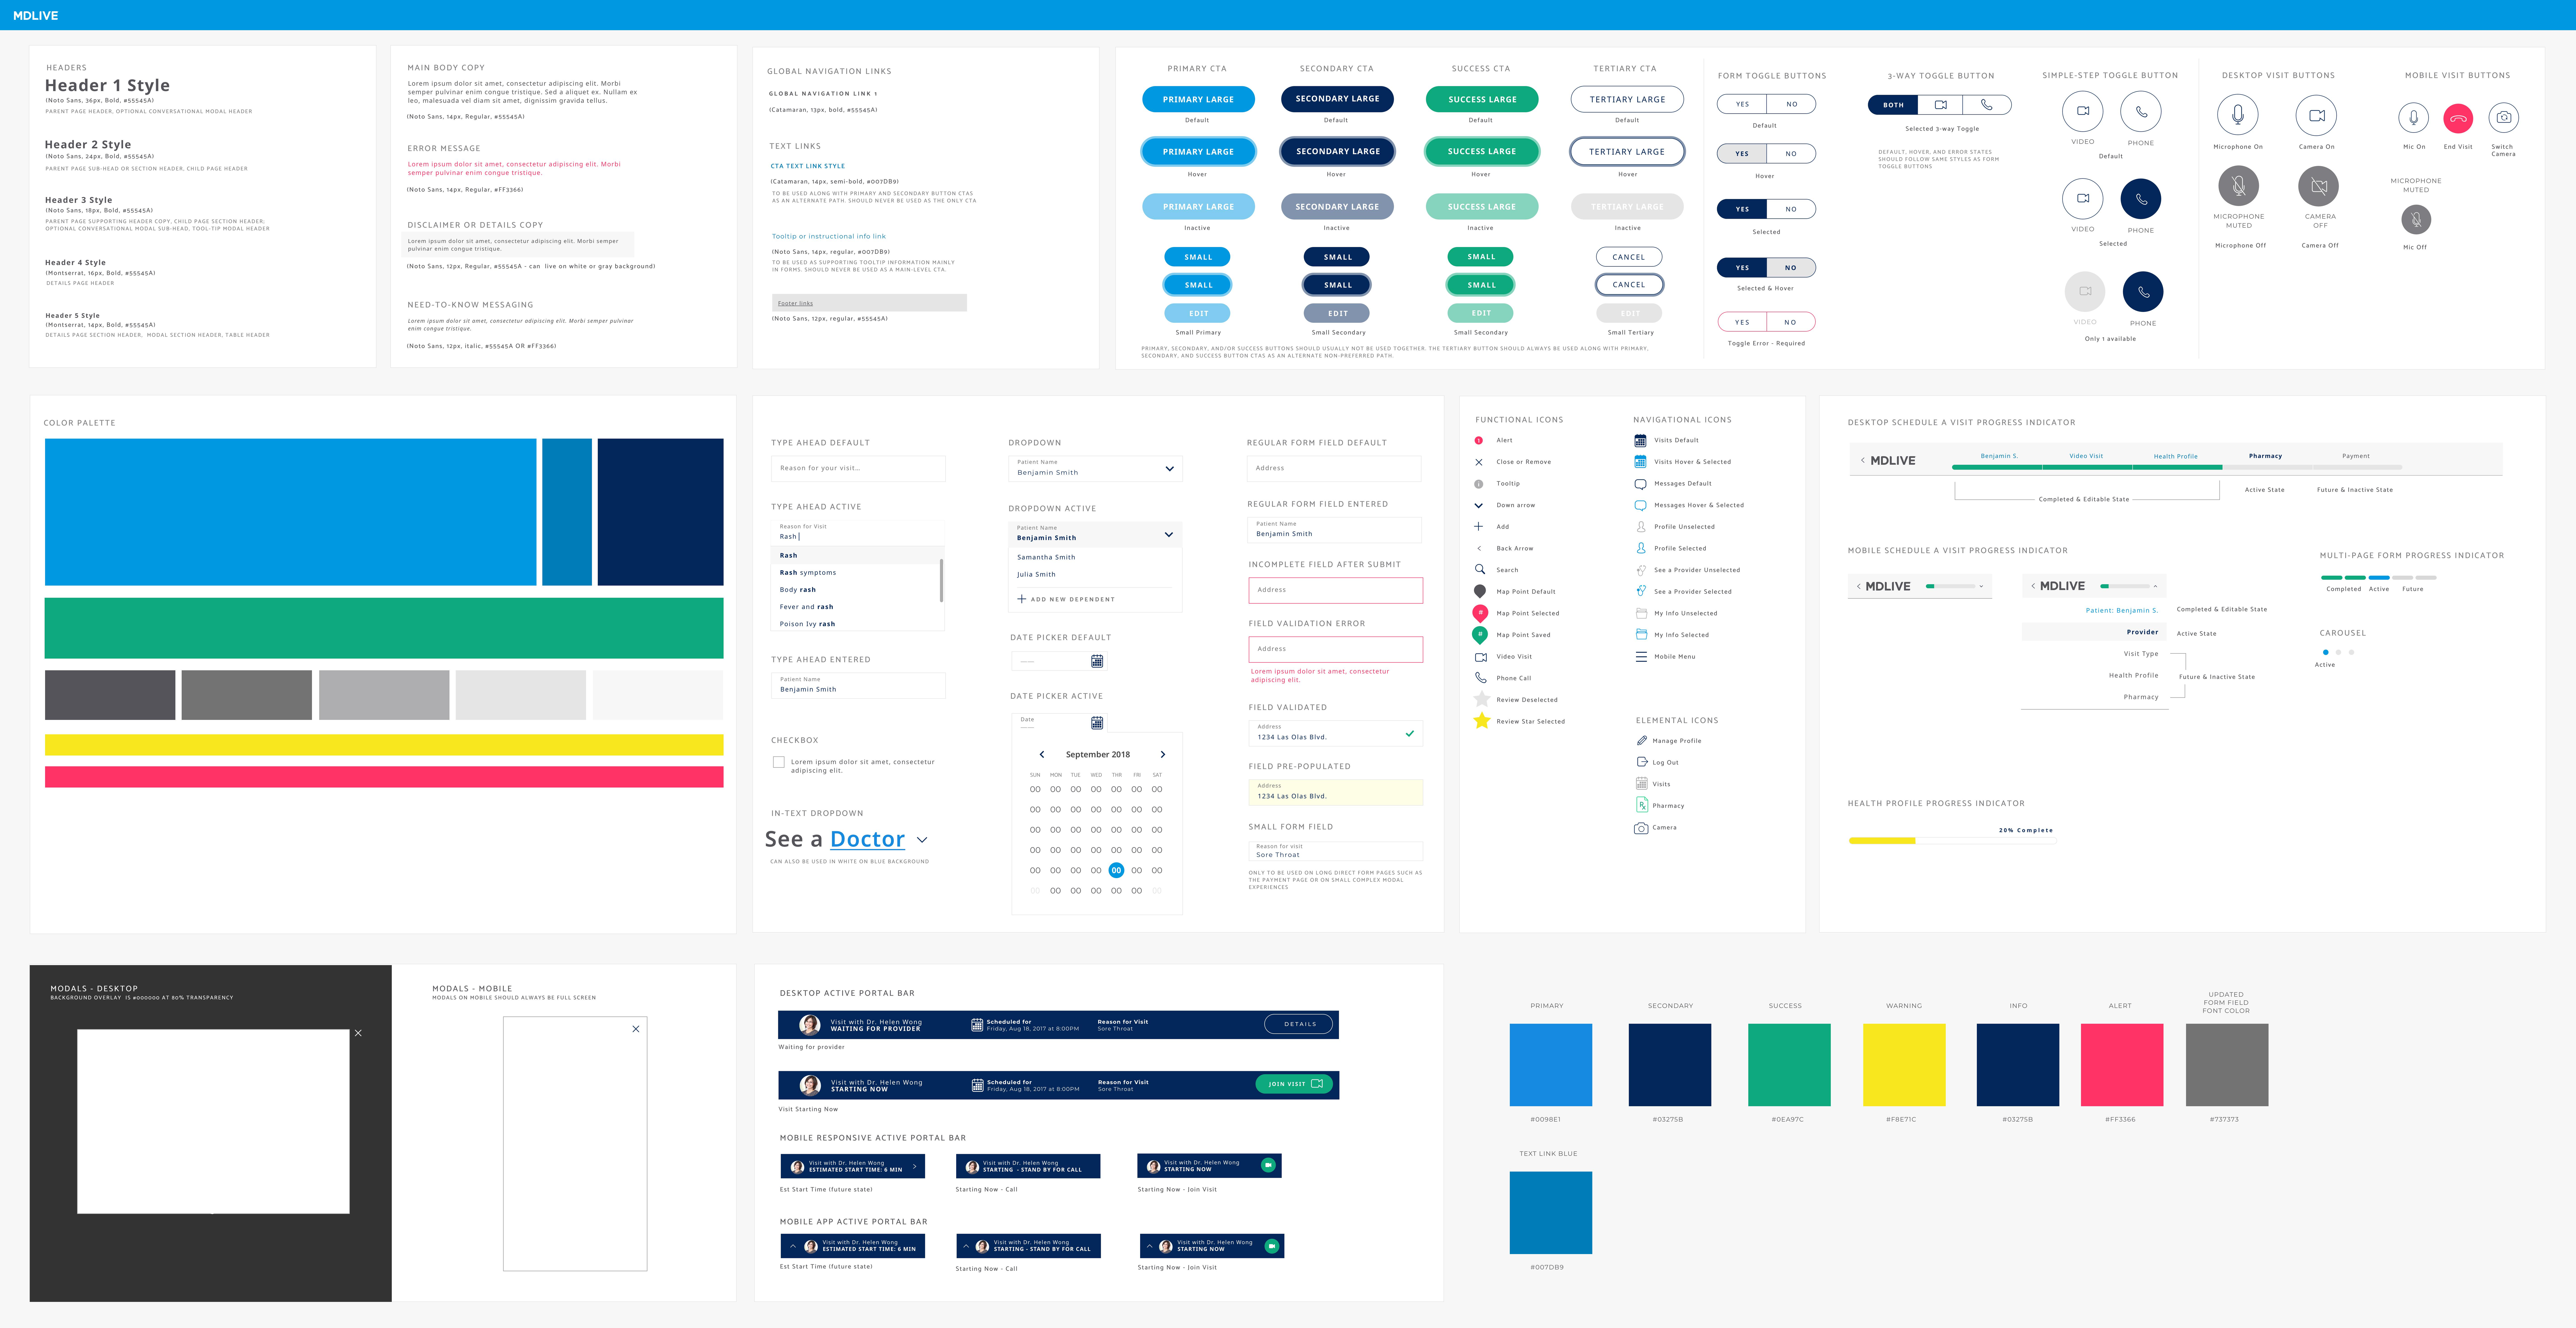 Full component sheet for the MDLIVE portal design system.